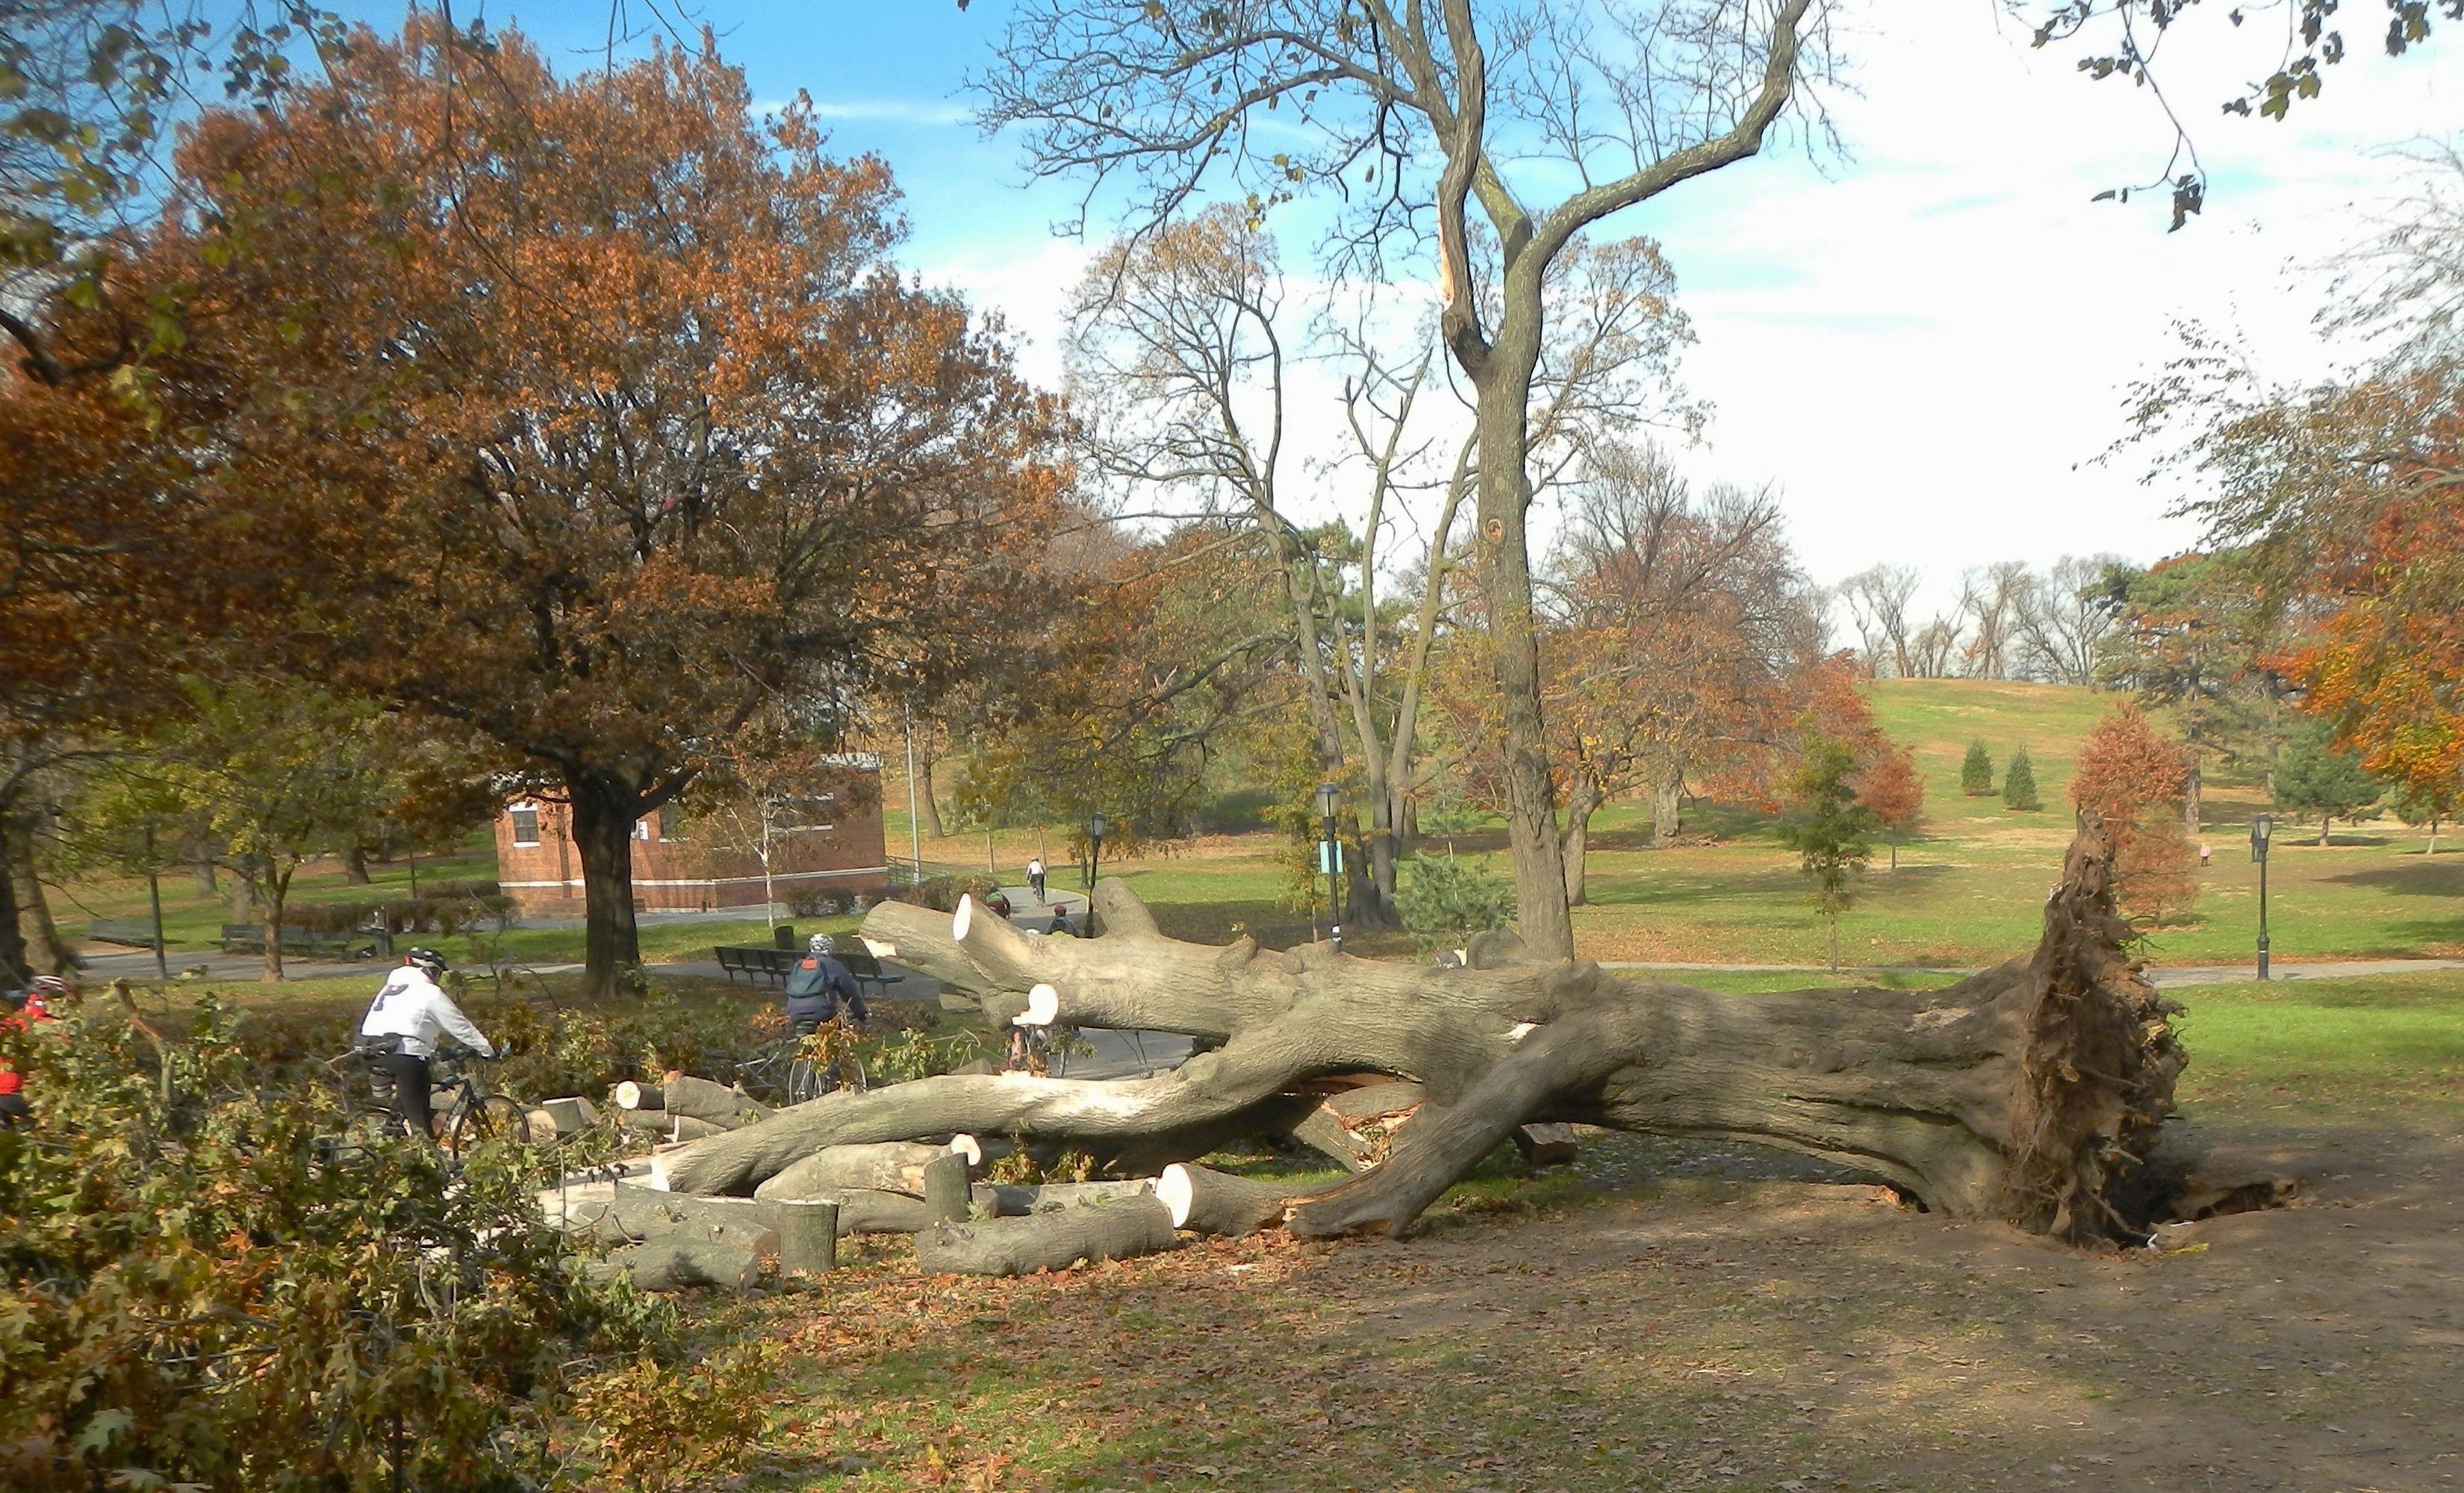 kostenlose foto arbeiten baum natur himmel fallen new york city herbst park brooklyn. Black Bedroom Furniture Sets. Home Design Ideas